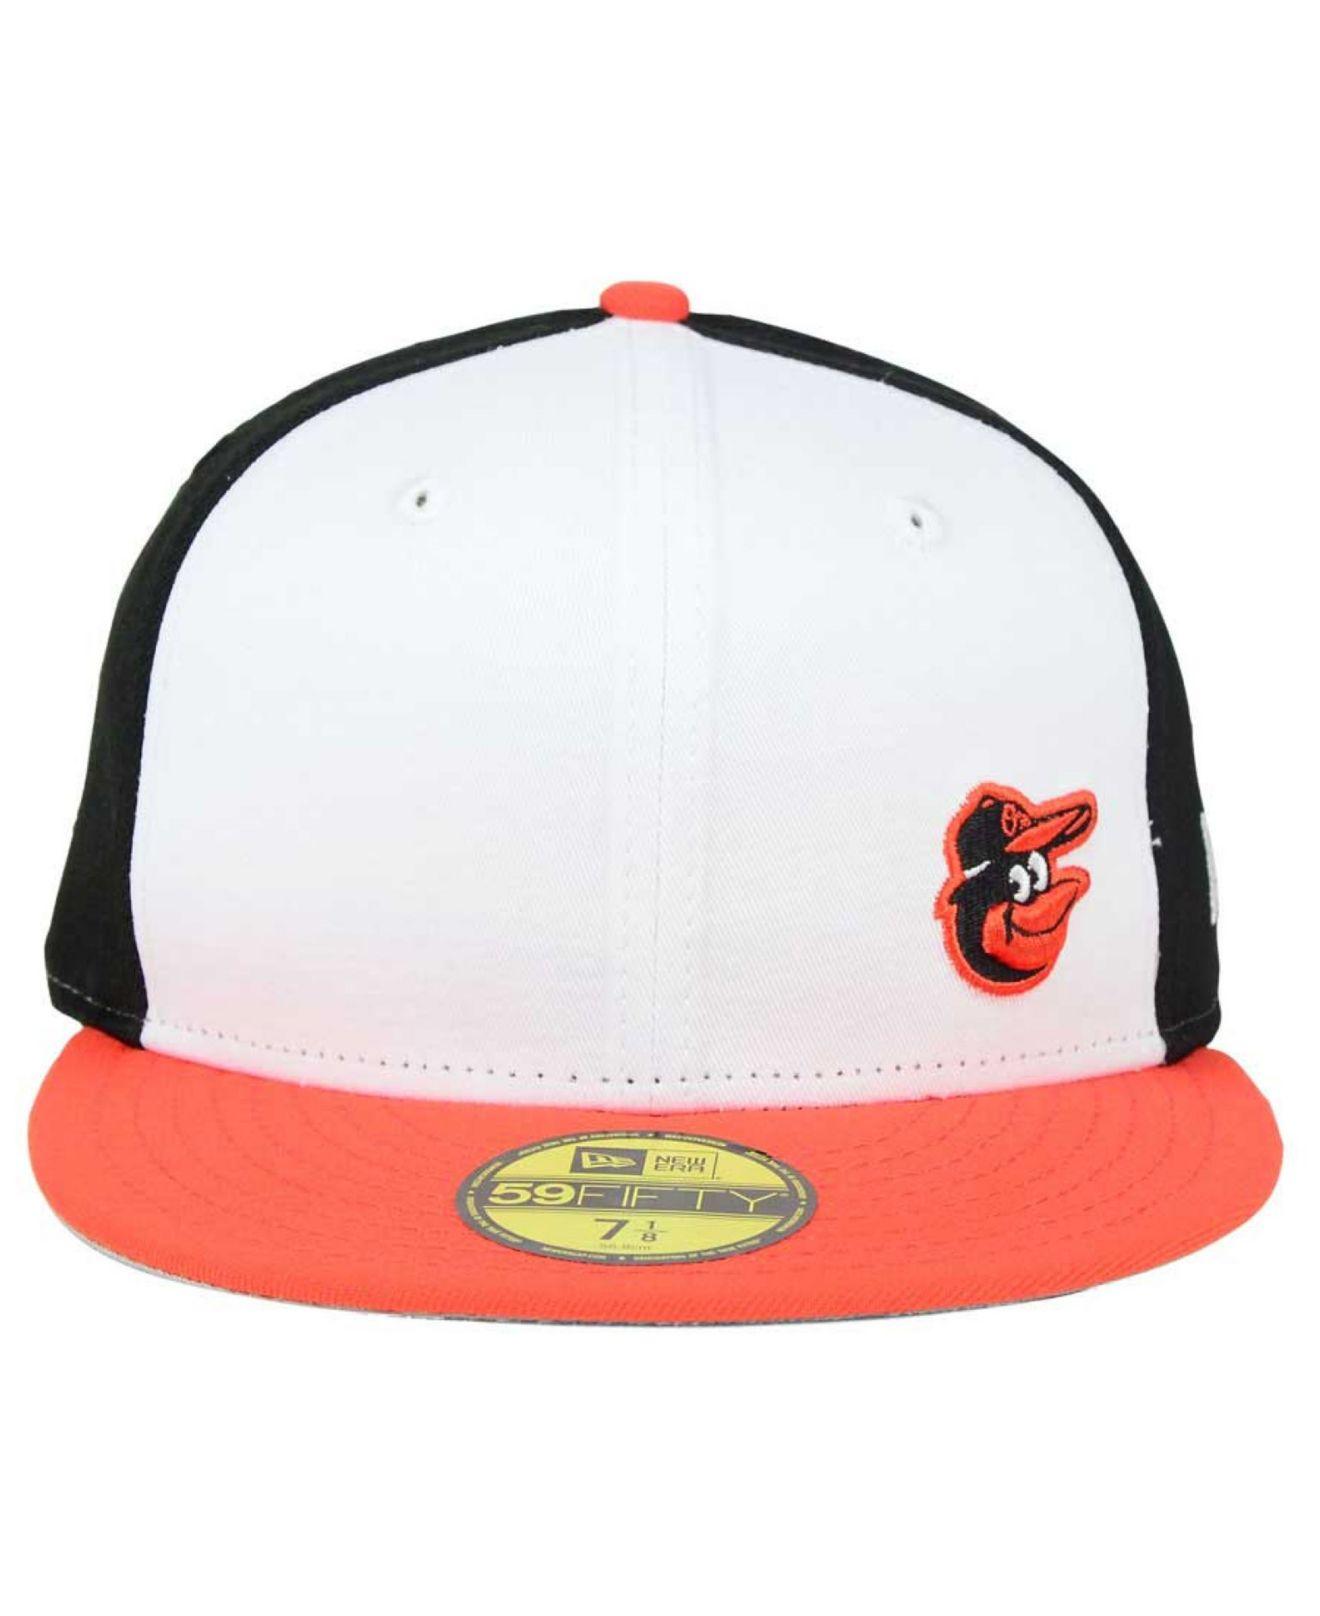 sale retailer d9a78 2f90f Lyst - KTZ Baltimore Orioles Smalls 59fifty Cap in White for Men